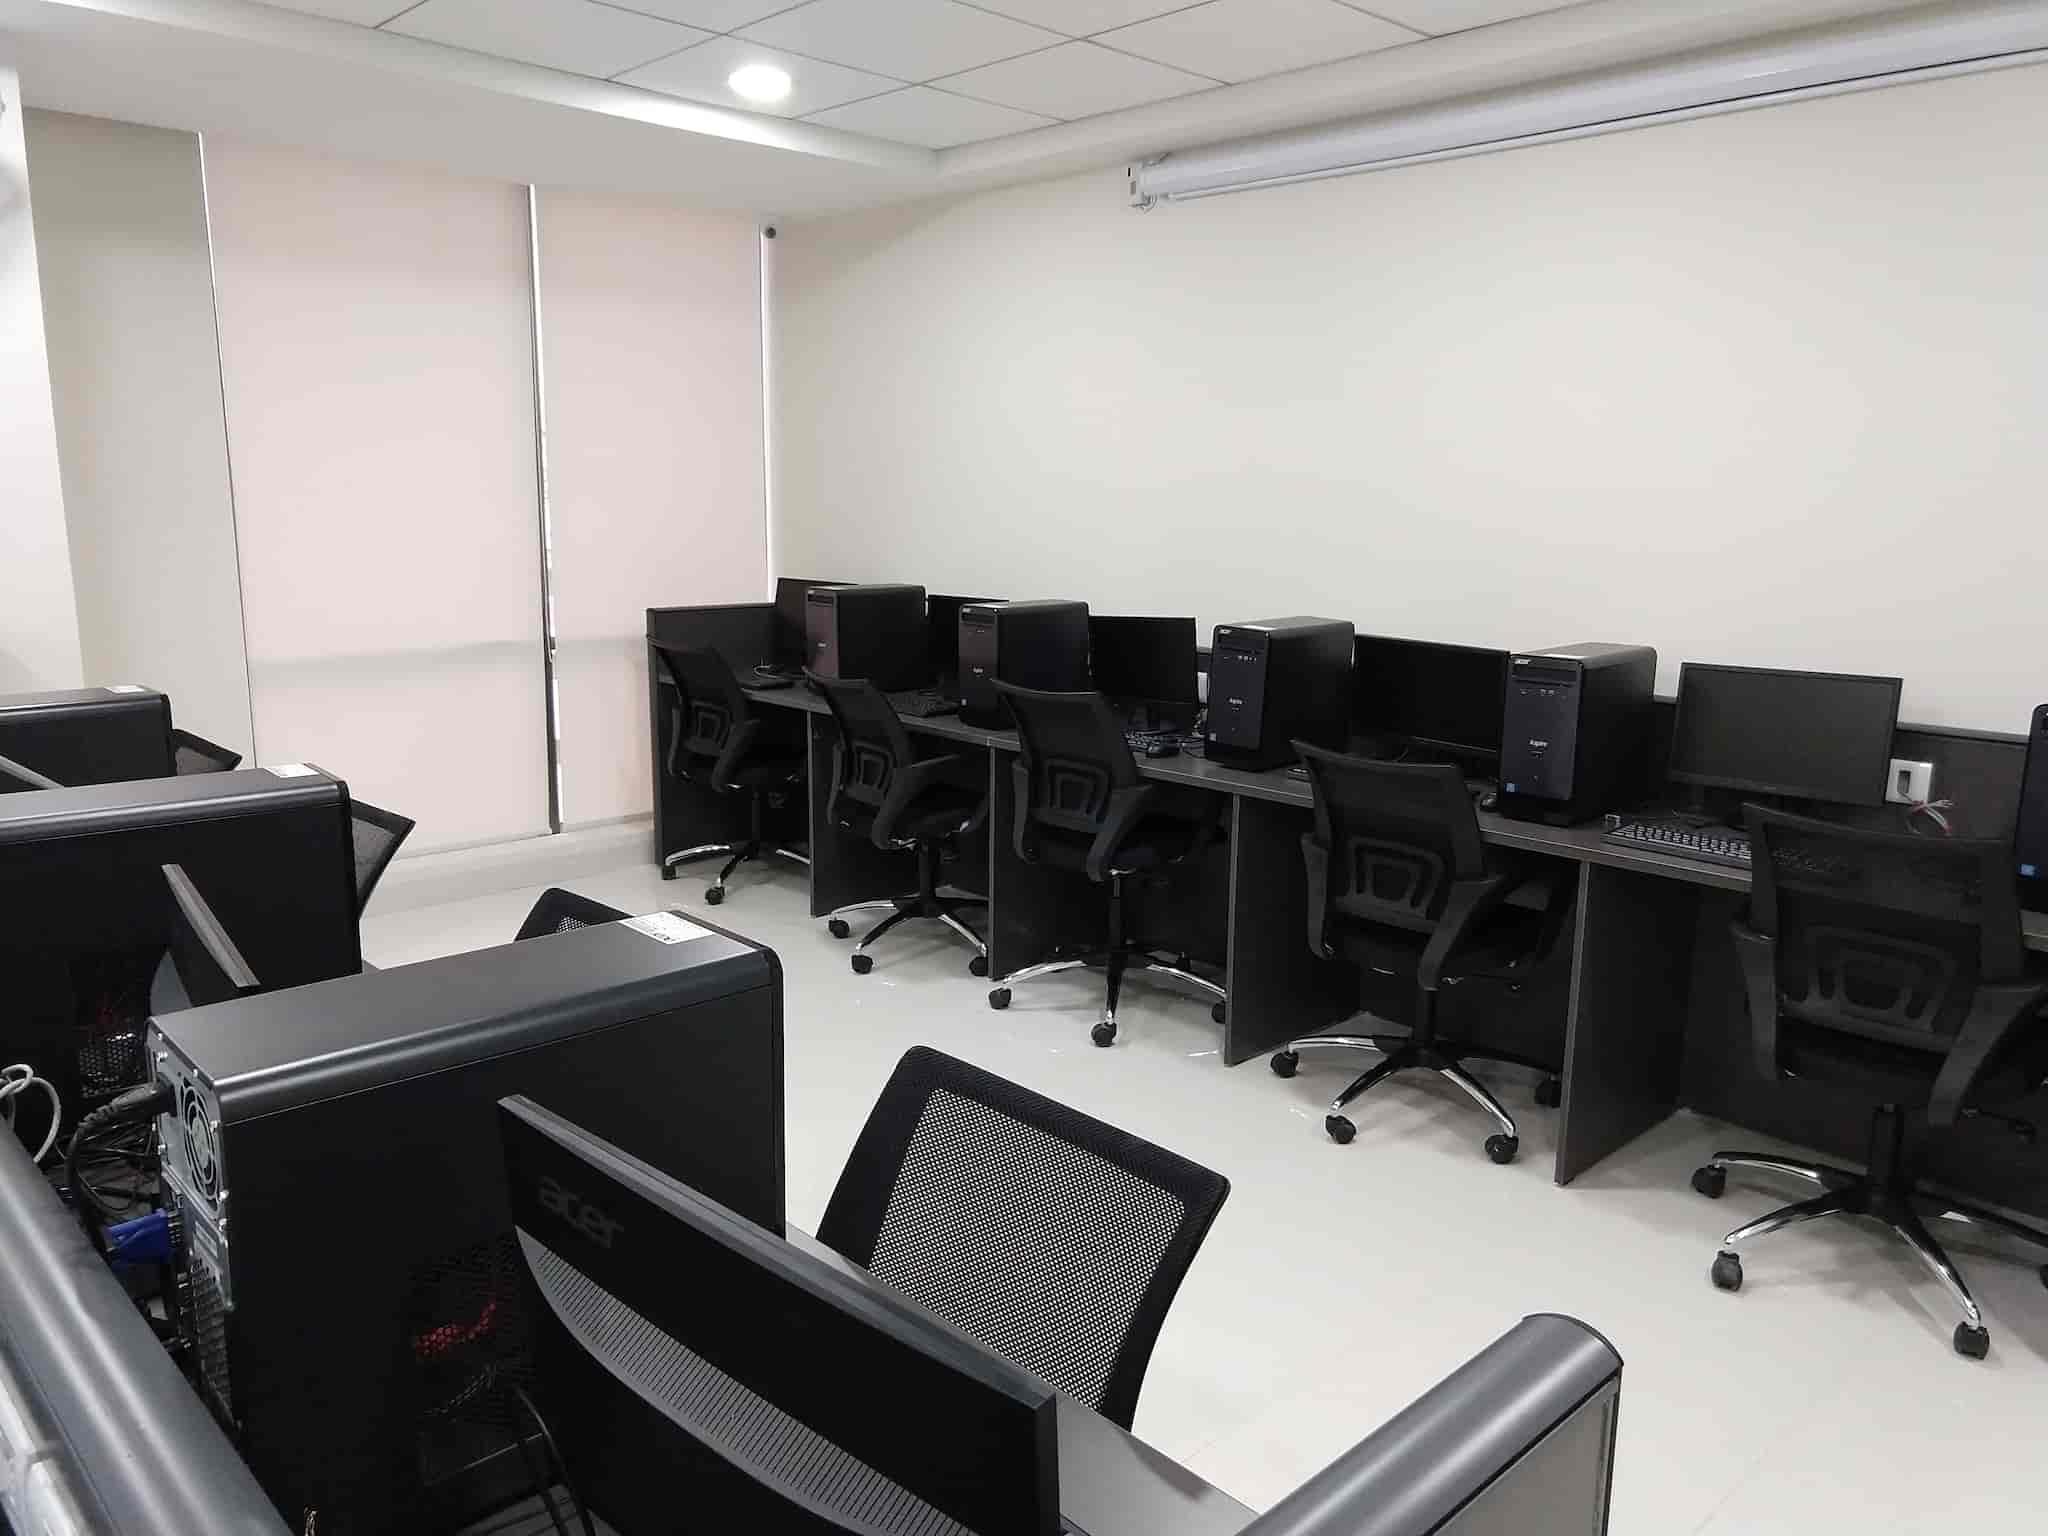 Samana Design School Madhapur Fashion Designing Institutes In Hyderabad Justdial